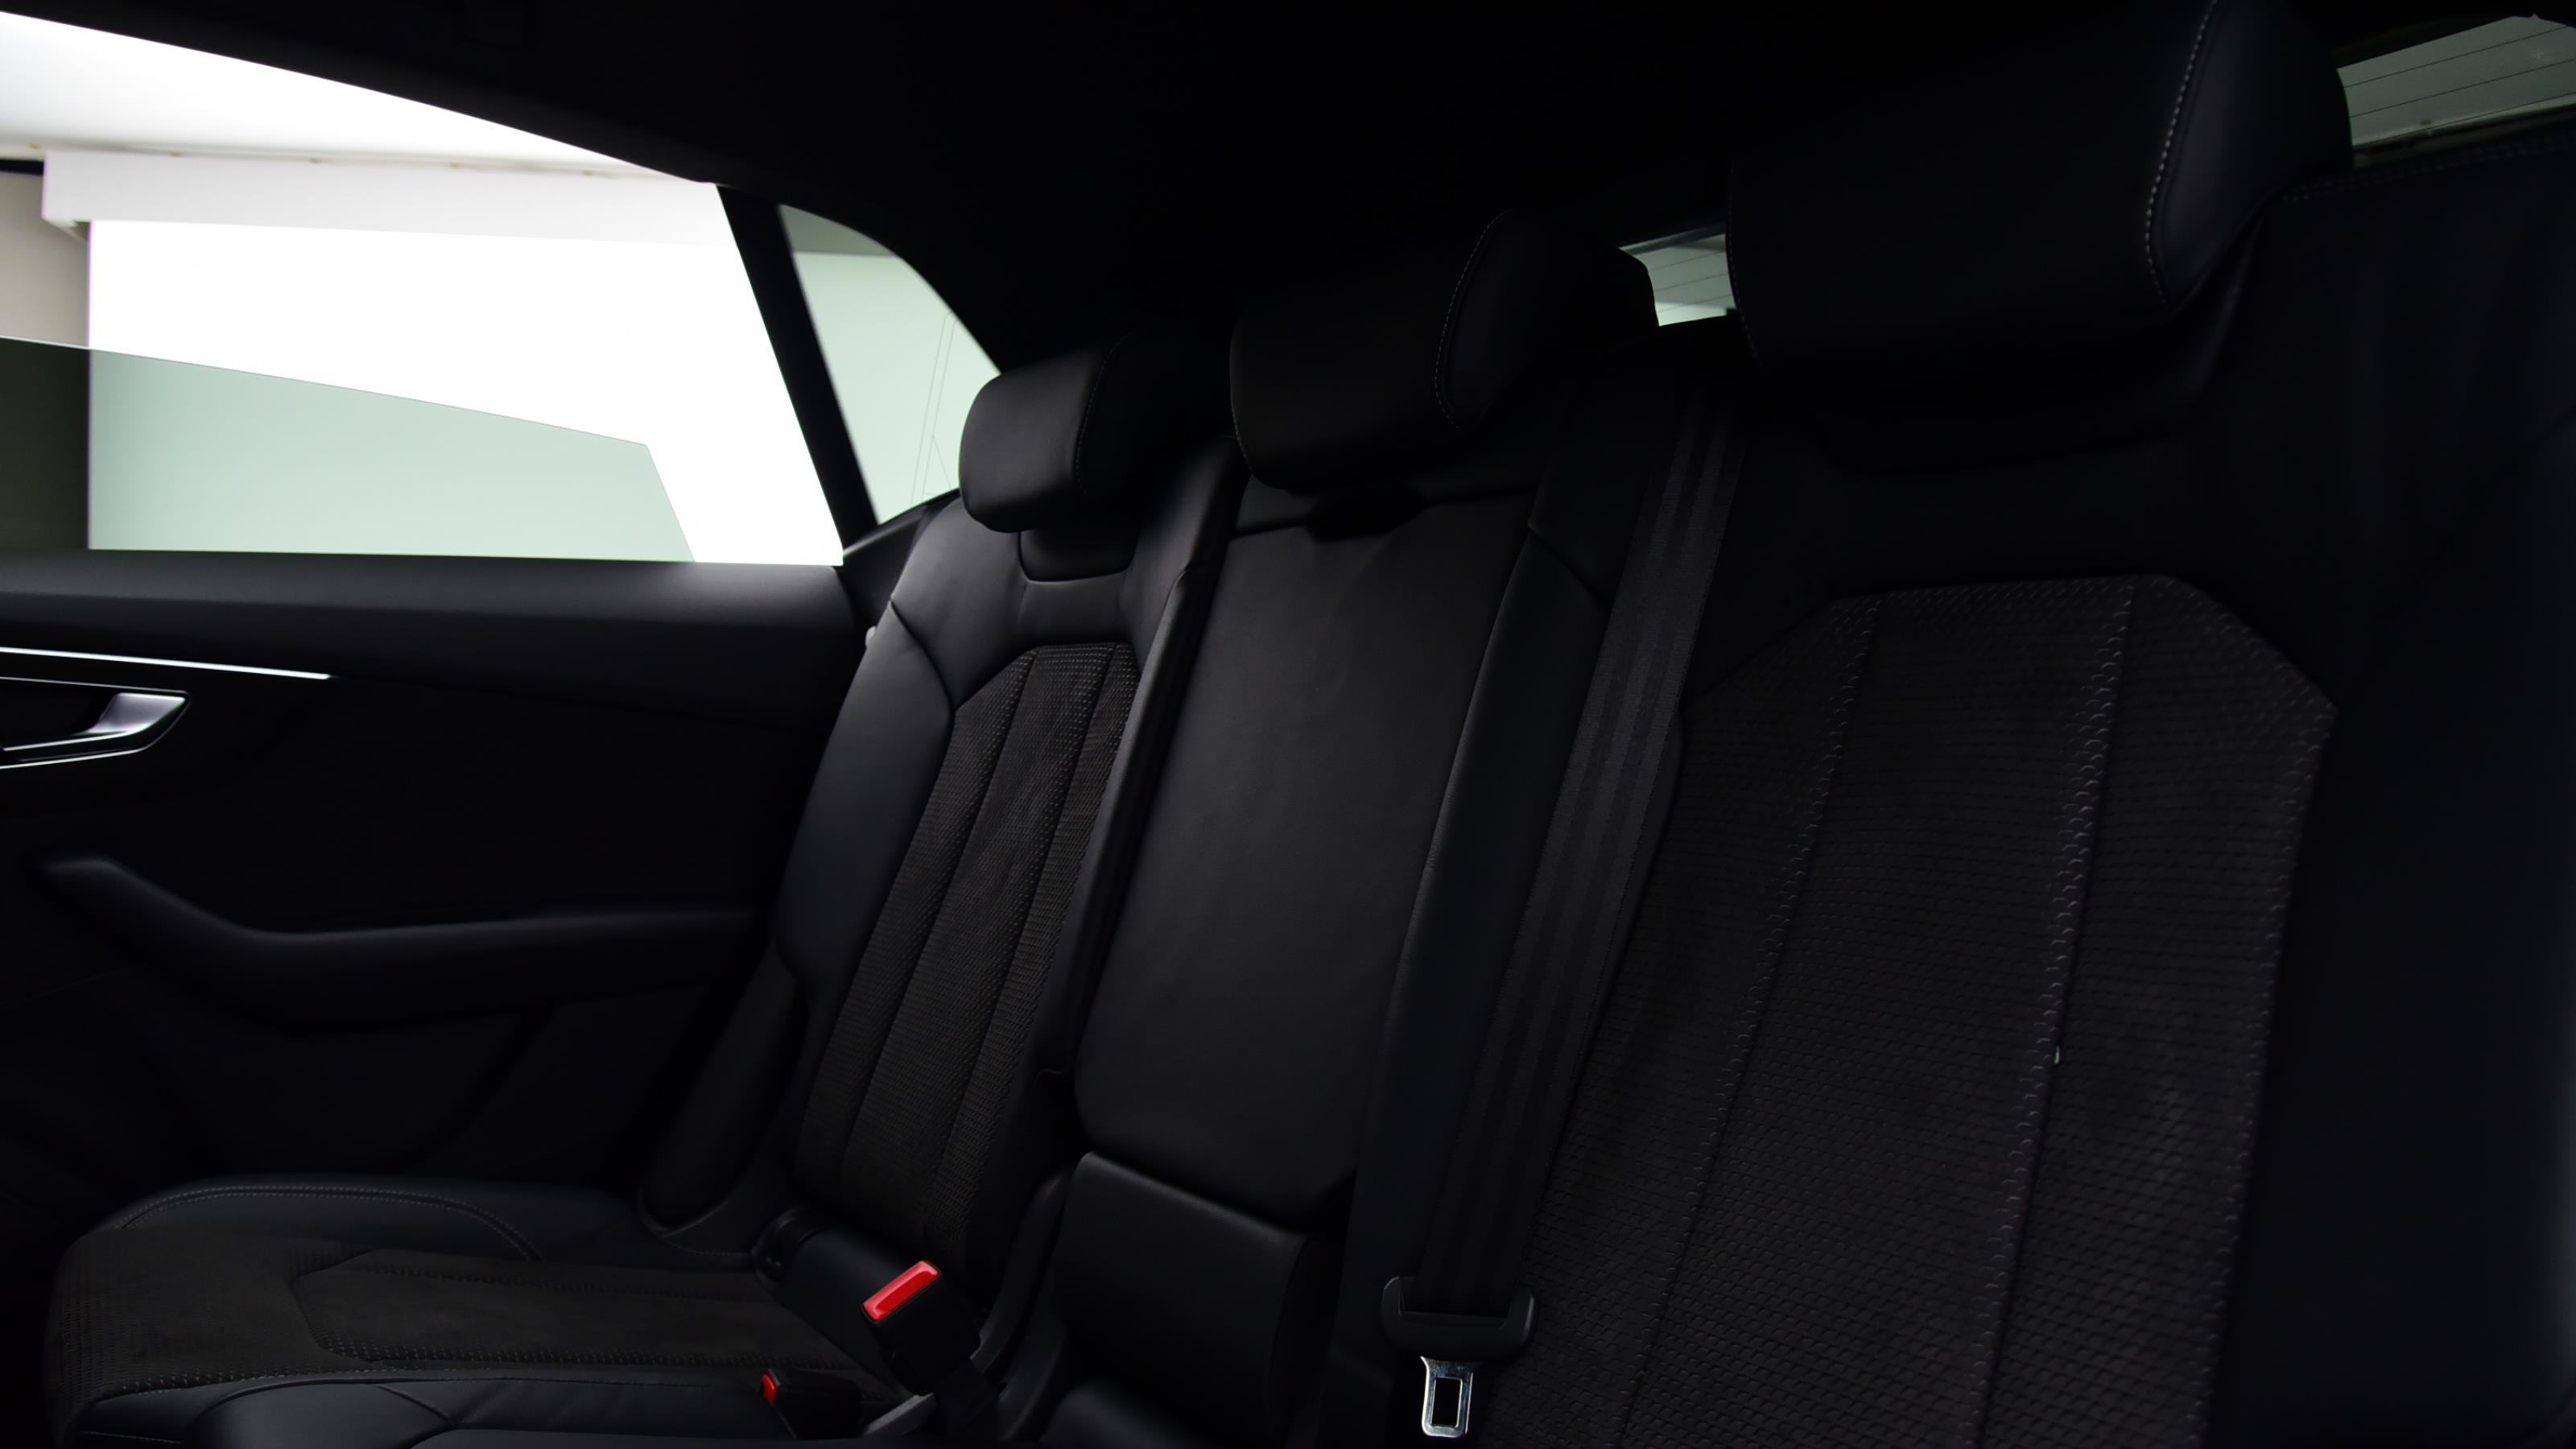 Used 2019 Audi Q8 50 TDI Quattro S Line 5dr Tiptronic BLUE at Saxton4x4